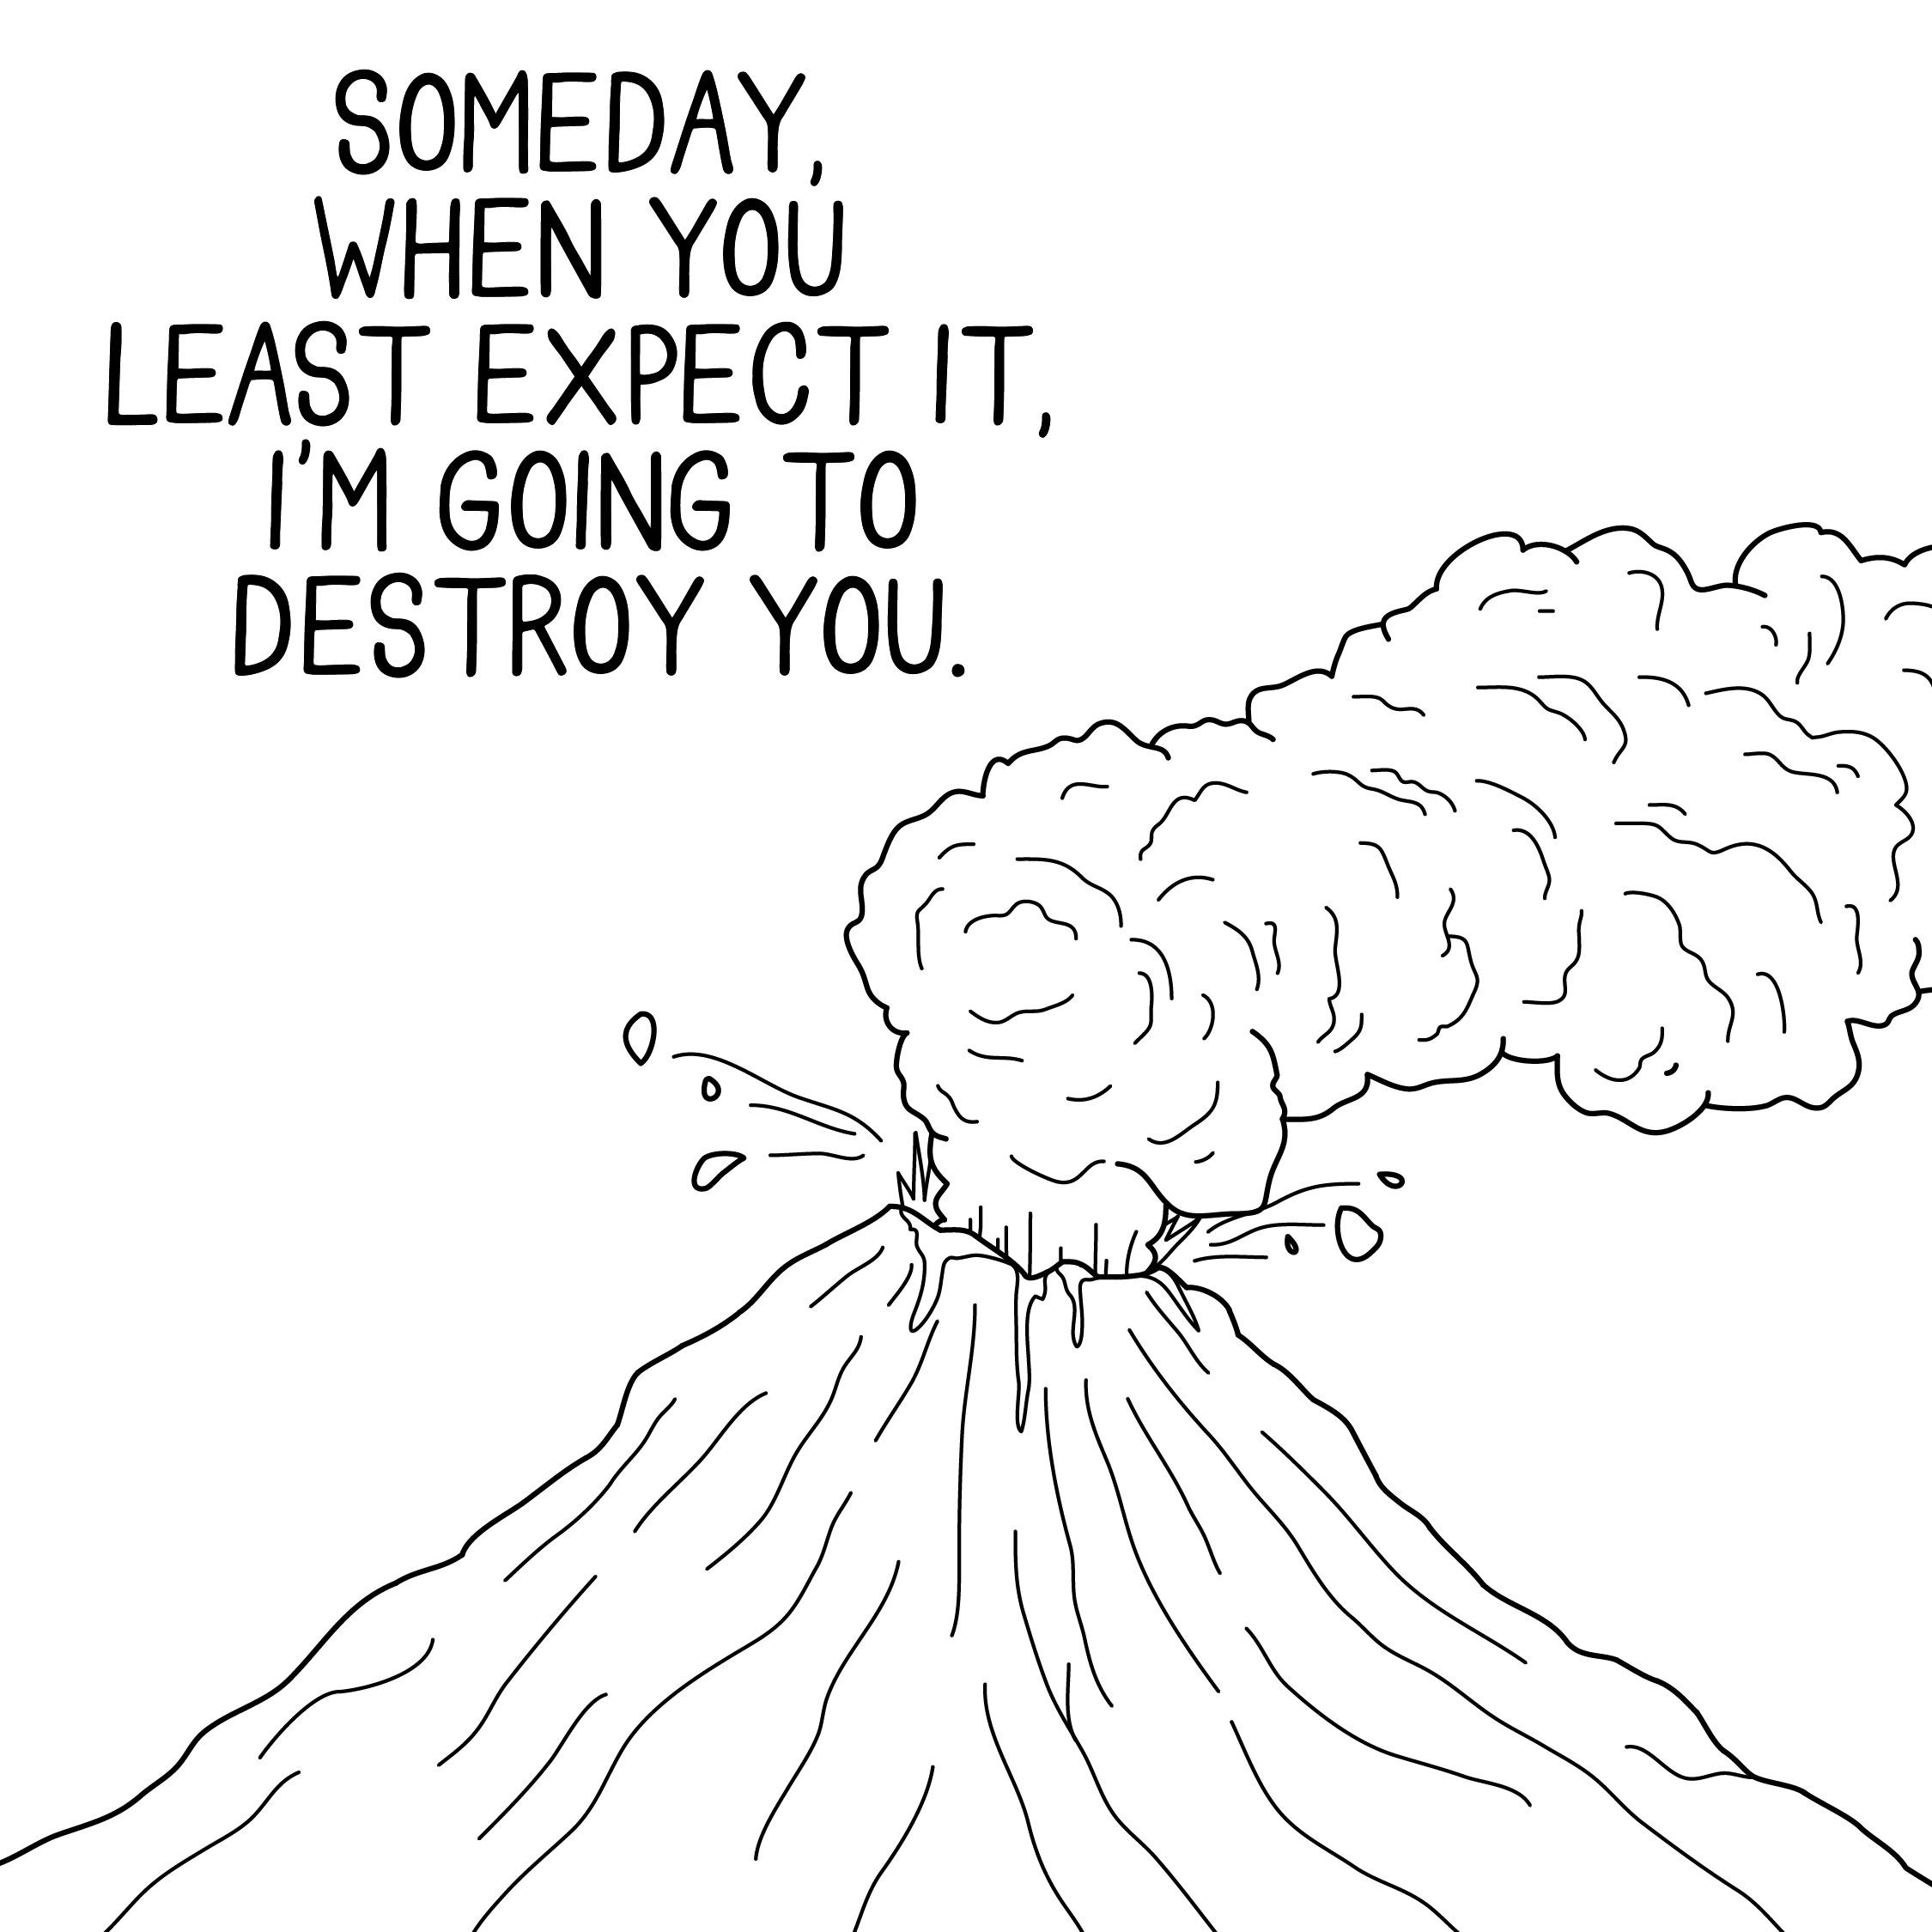 destroyyou-01.jpg